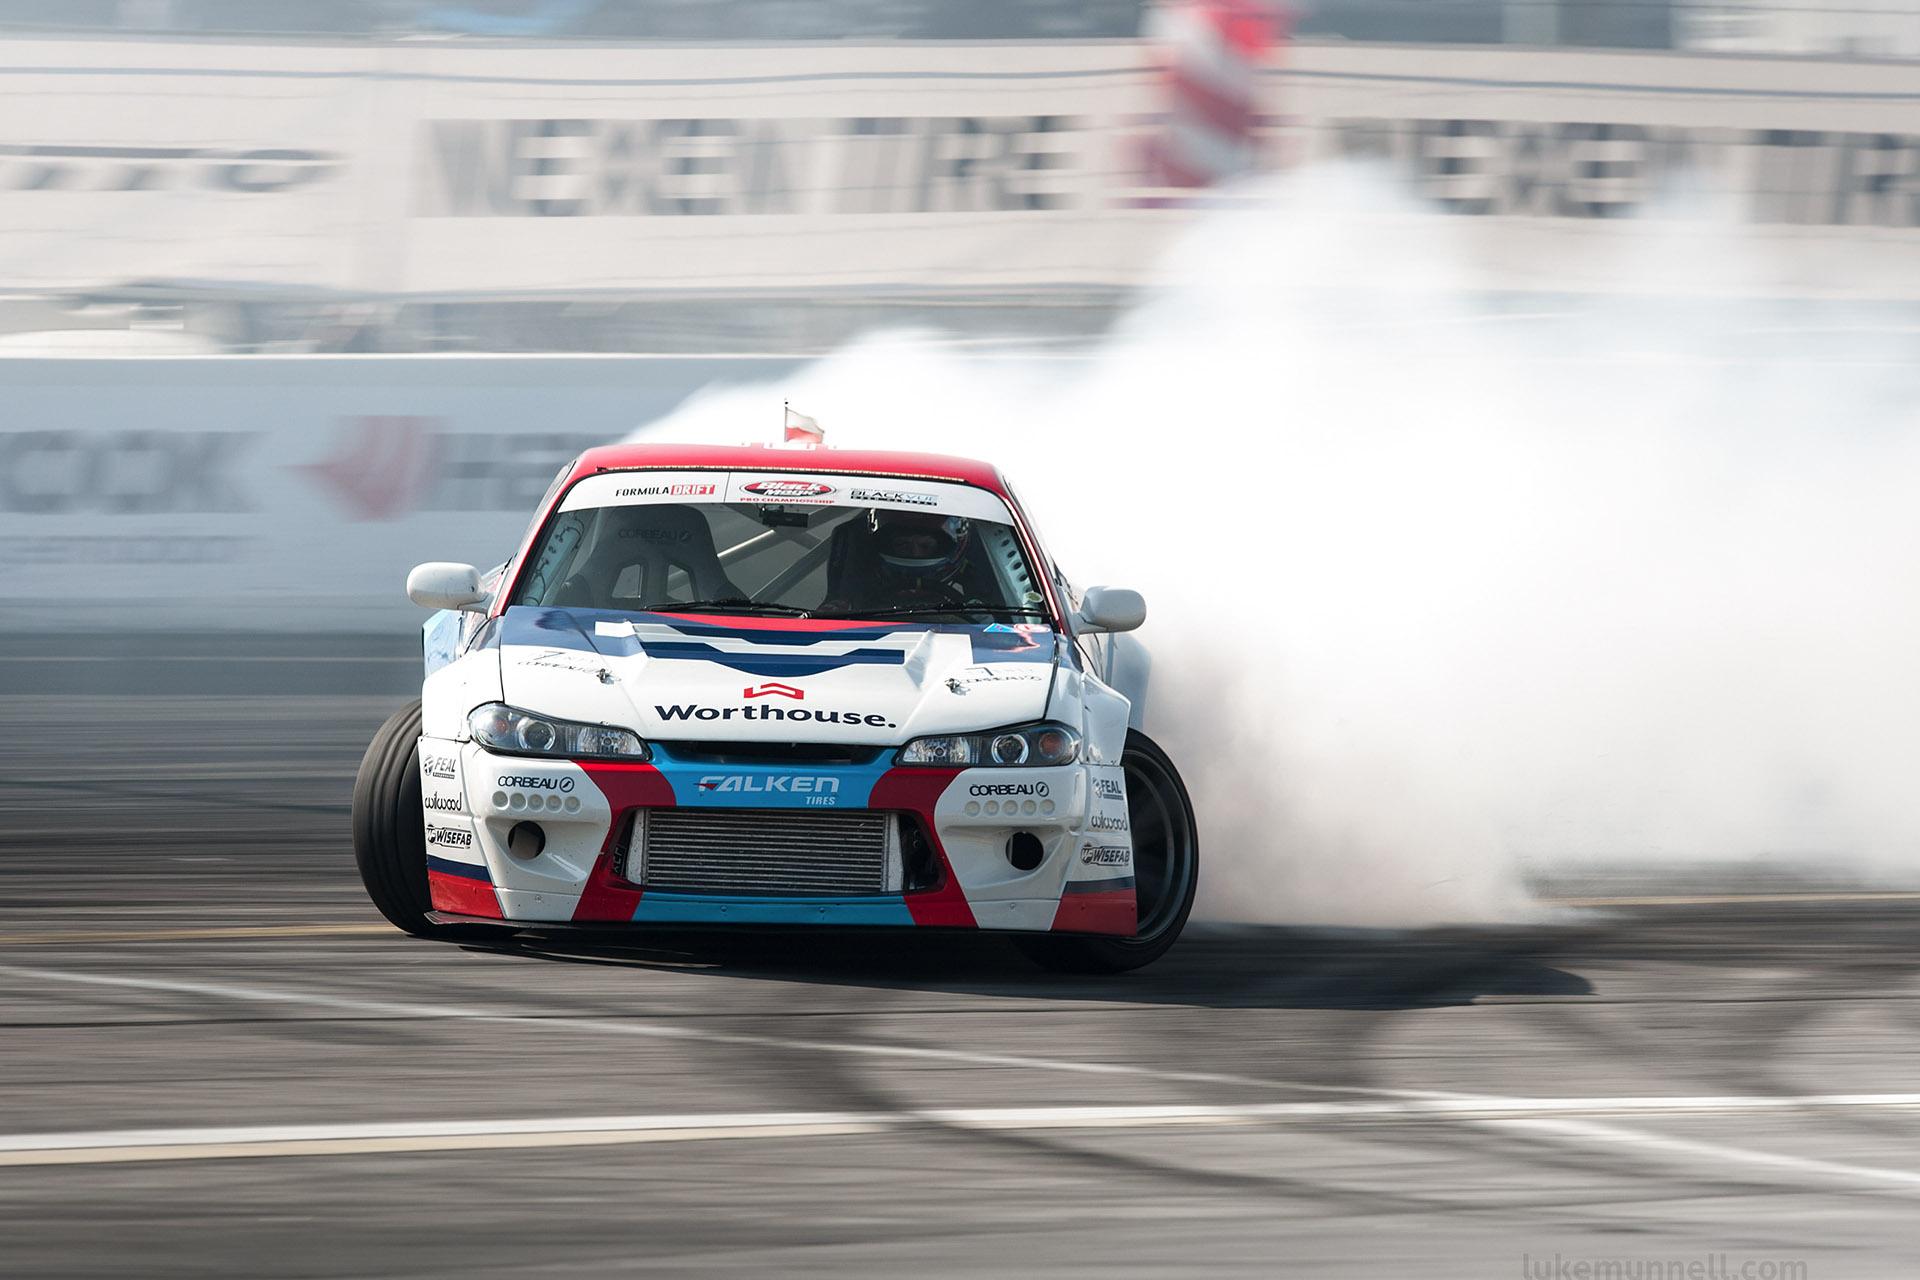 luke Munnell motorsports photography Formula Drift Irwindale Worthouse Nissan S15 Silvia Piotr Wiecek in smokey drift